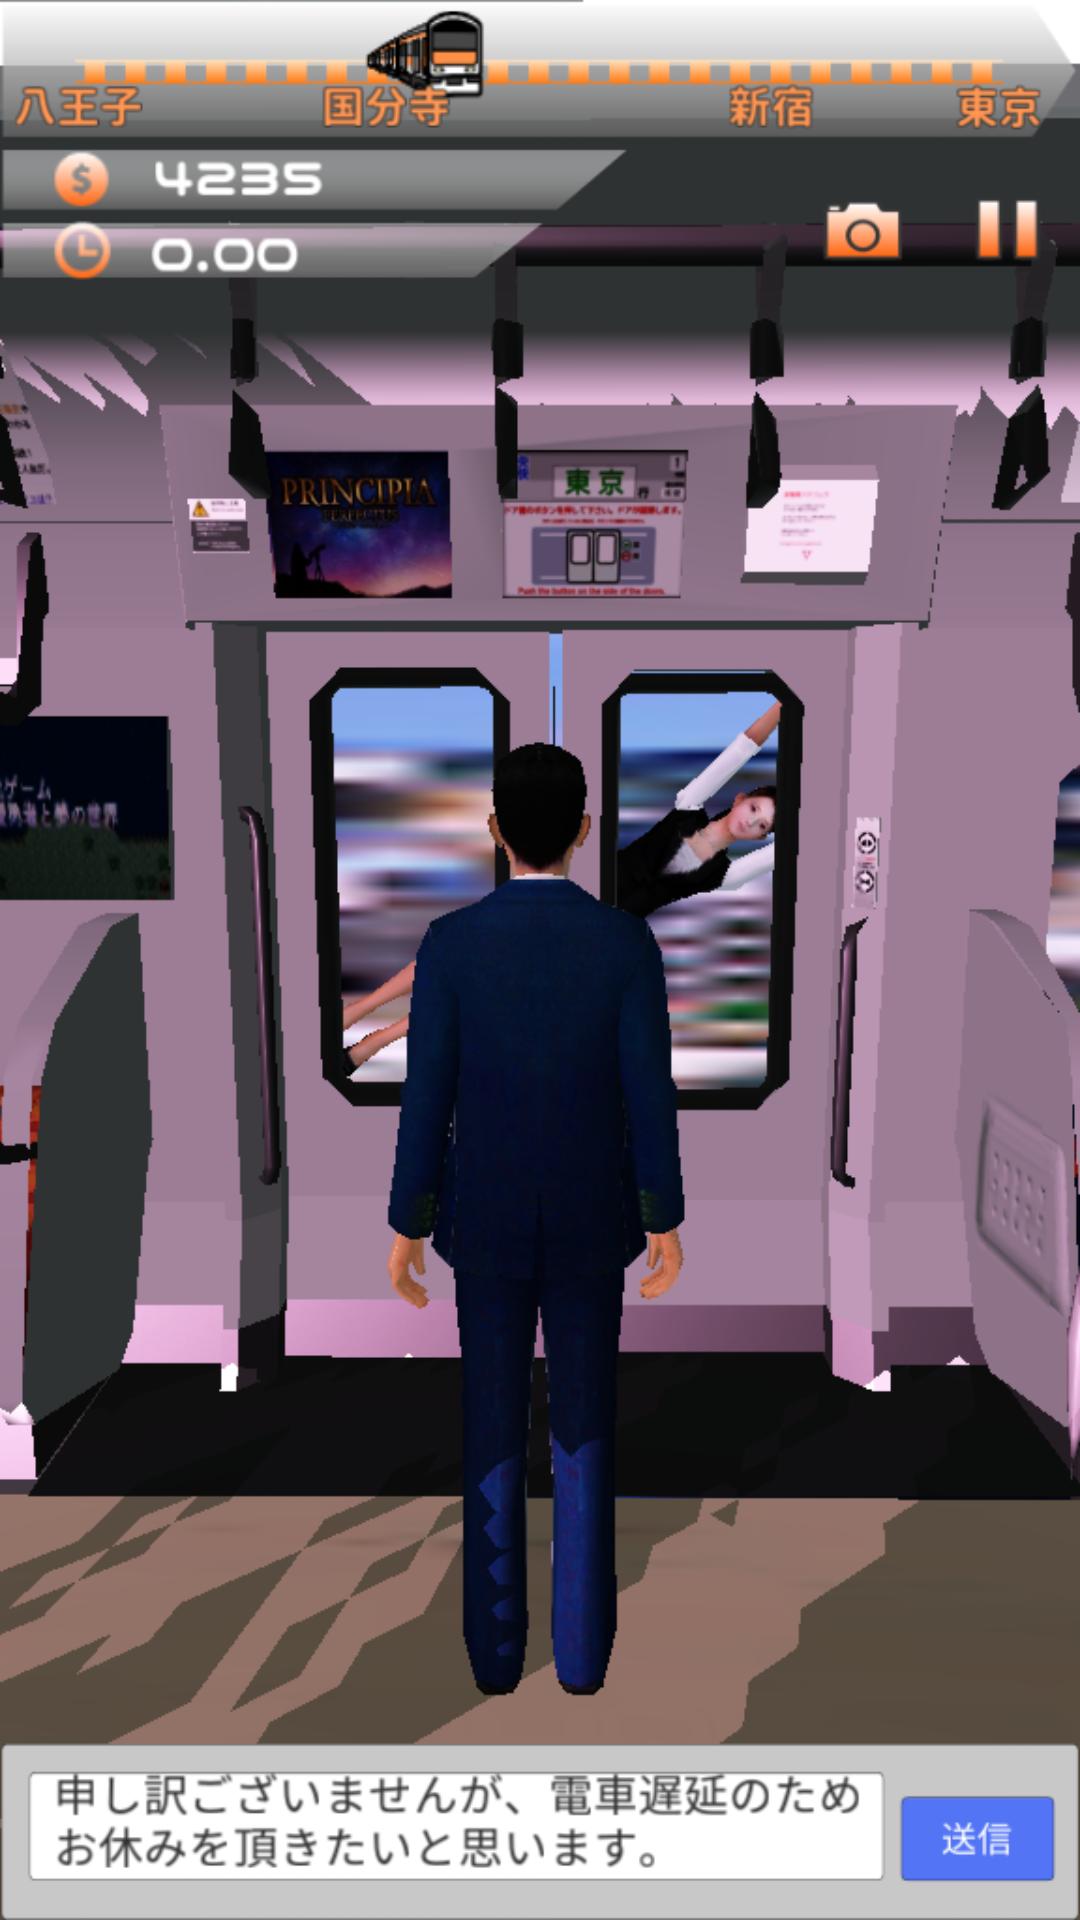 androidアプリ 30秒で通勤する方法〜八王子から東京駅まで〜攻略スクリーンショット6